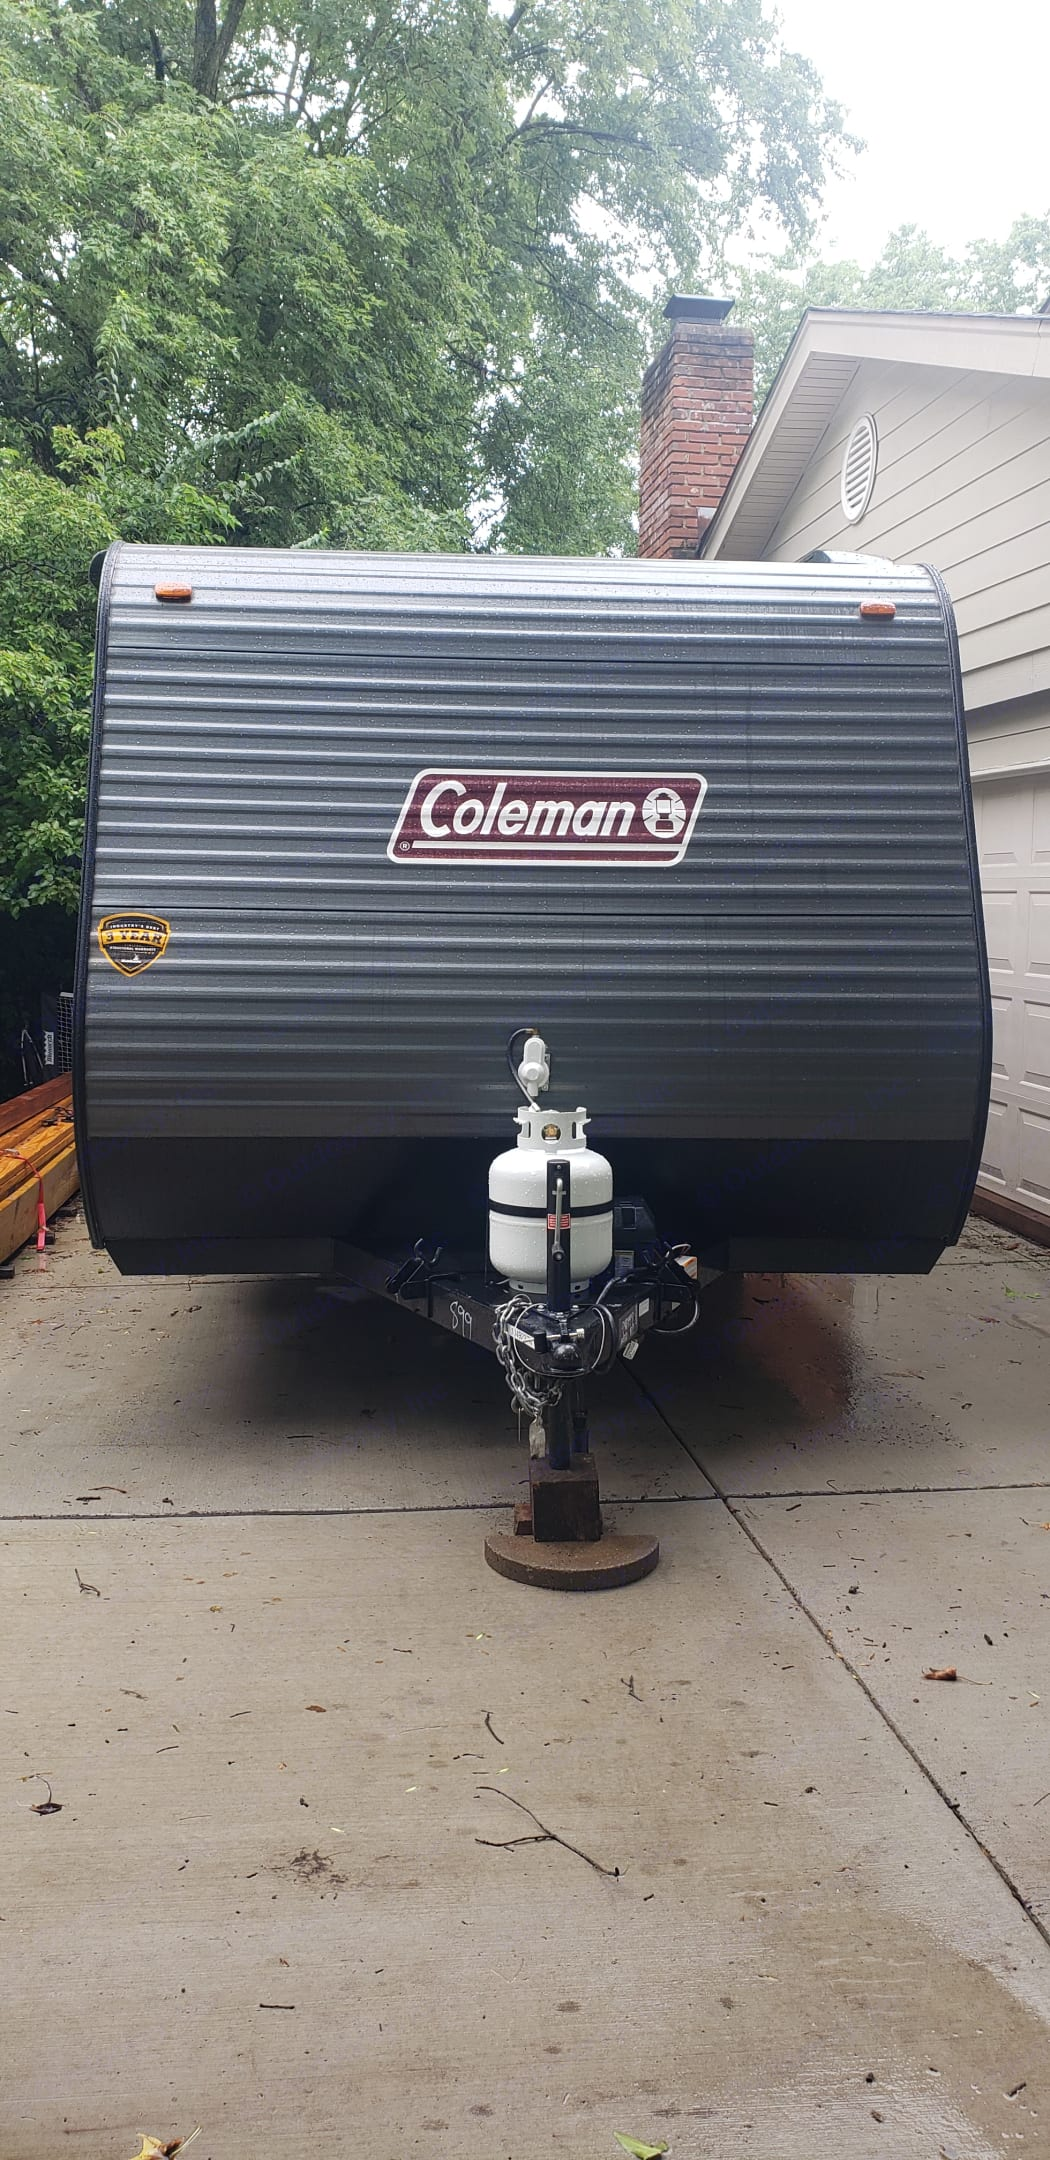 A light weight towable made of durable aluminum!. Dutchmen Coleman 2021